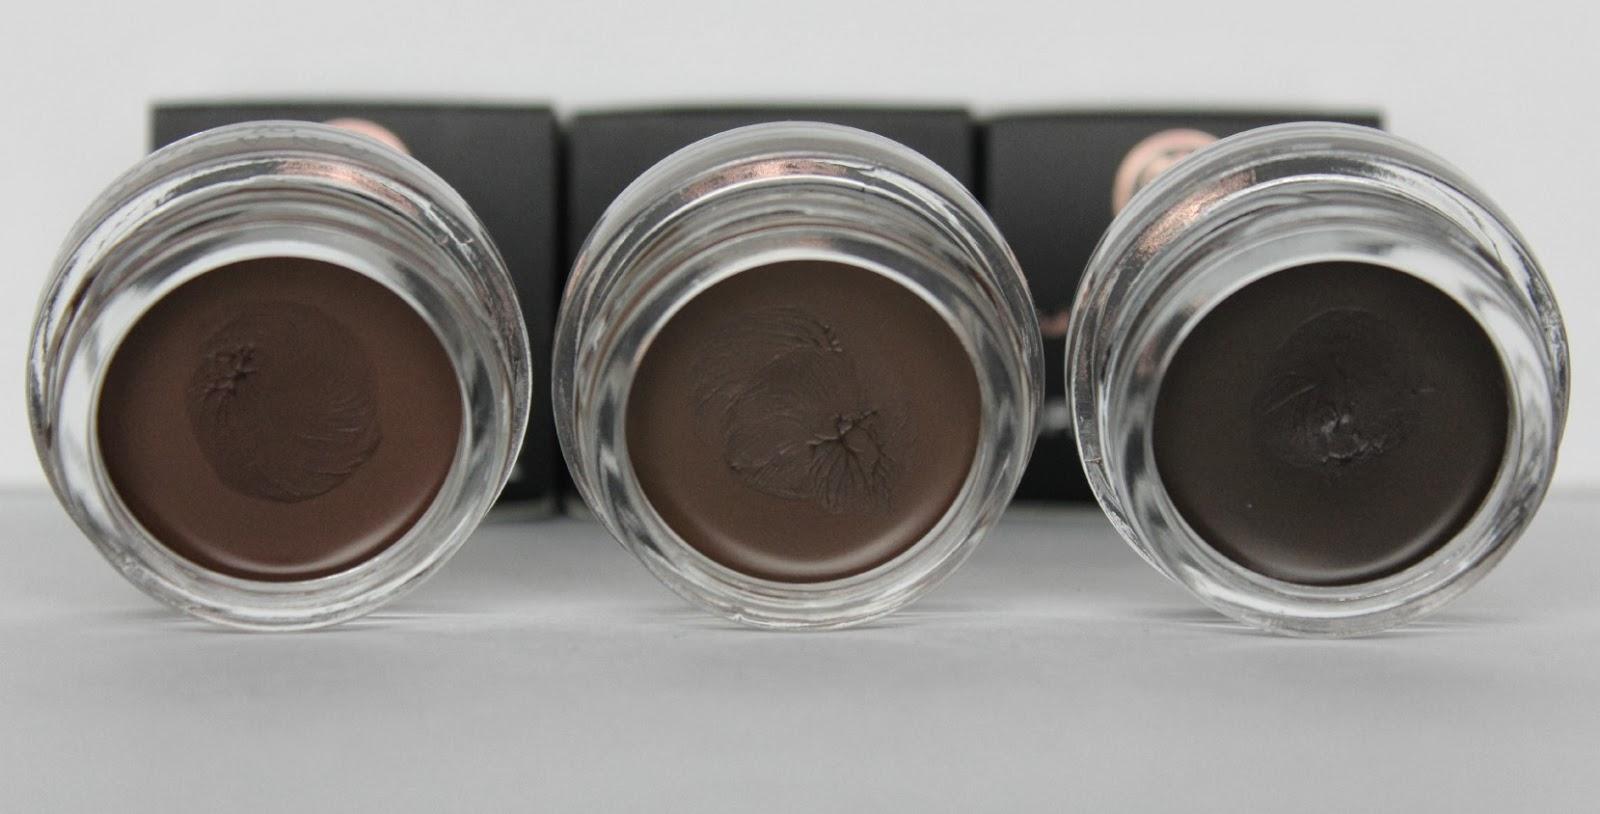 anastasia beverly hills dipbrow pomade chocolate dark brown ebony 7